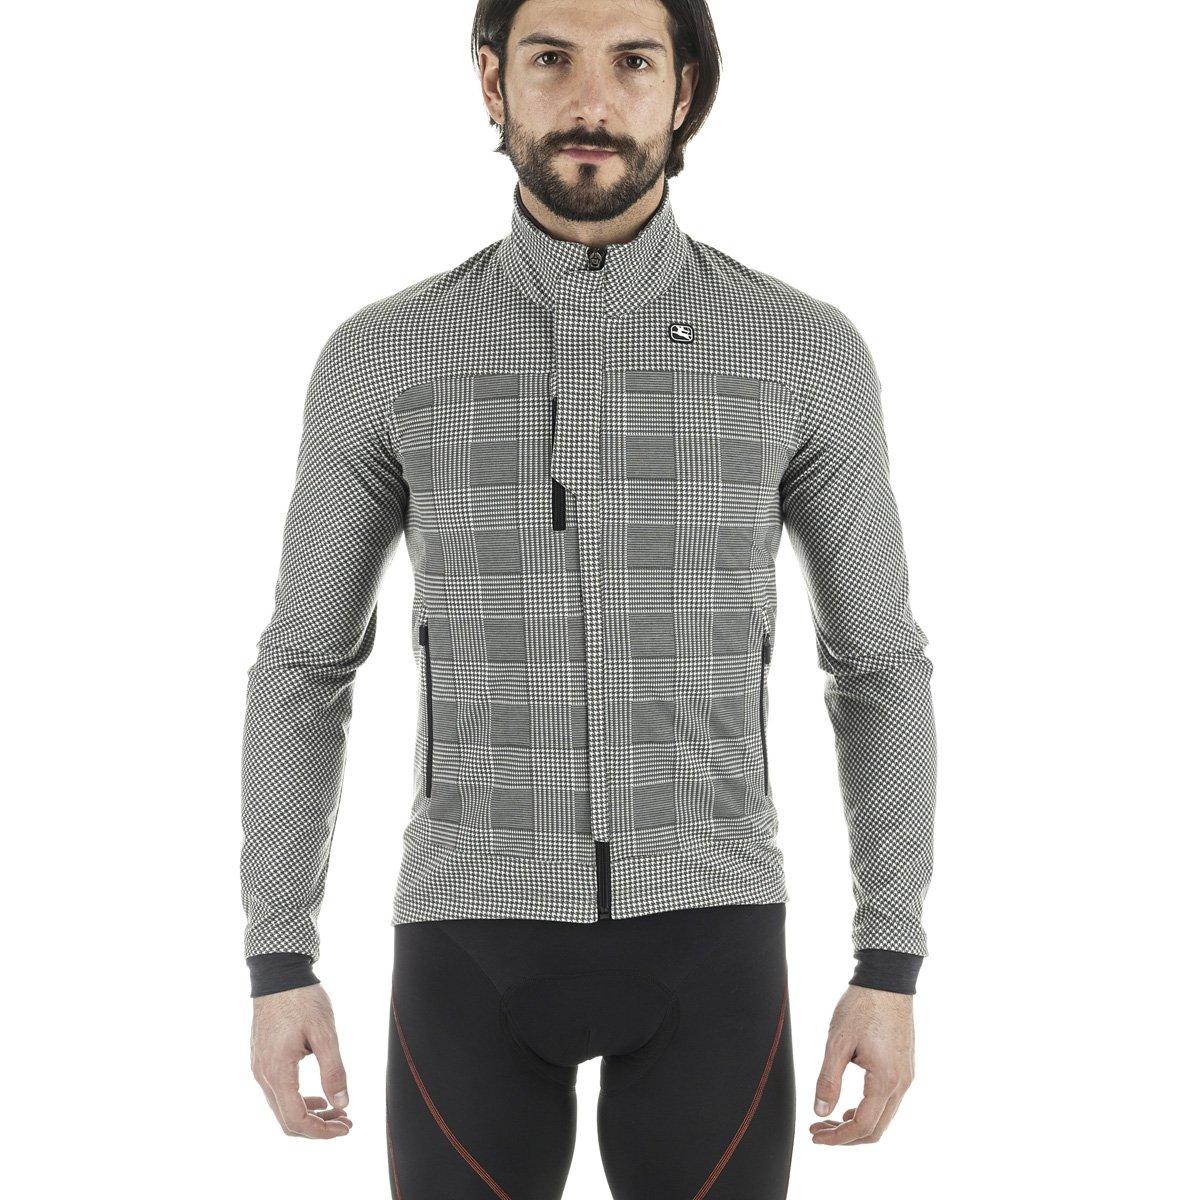 Giordana sosta Winter Jacket – Men 's B01M6VZXXS X-Large|グレーのチェック柄 グレーのチェック柄 X-Large